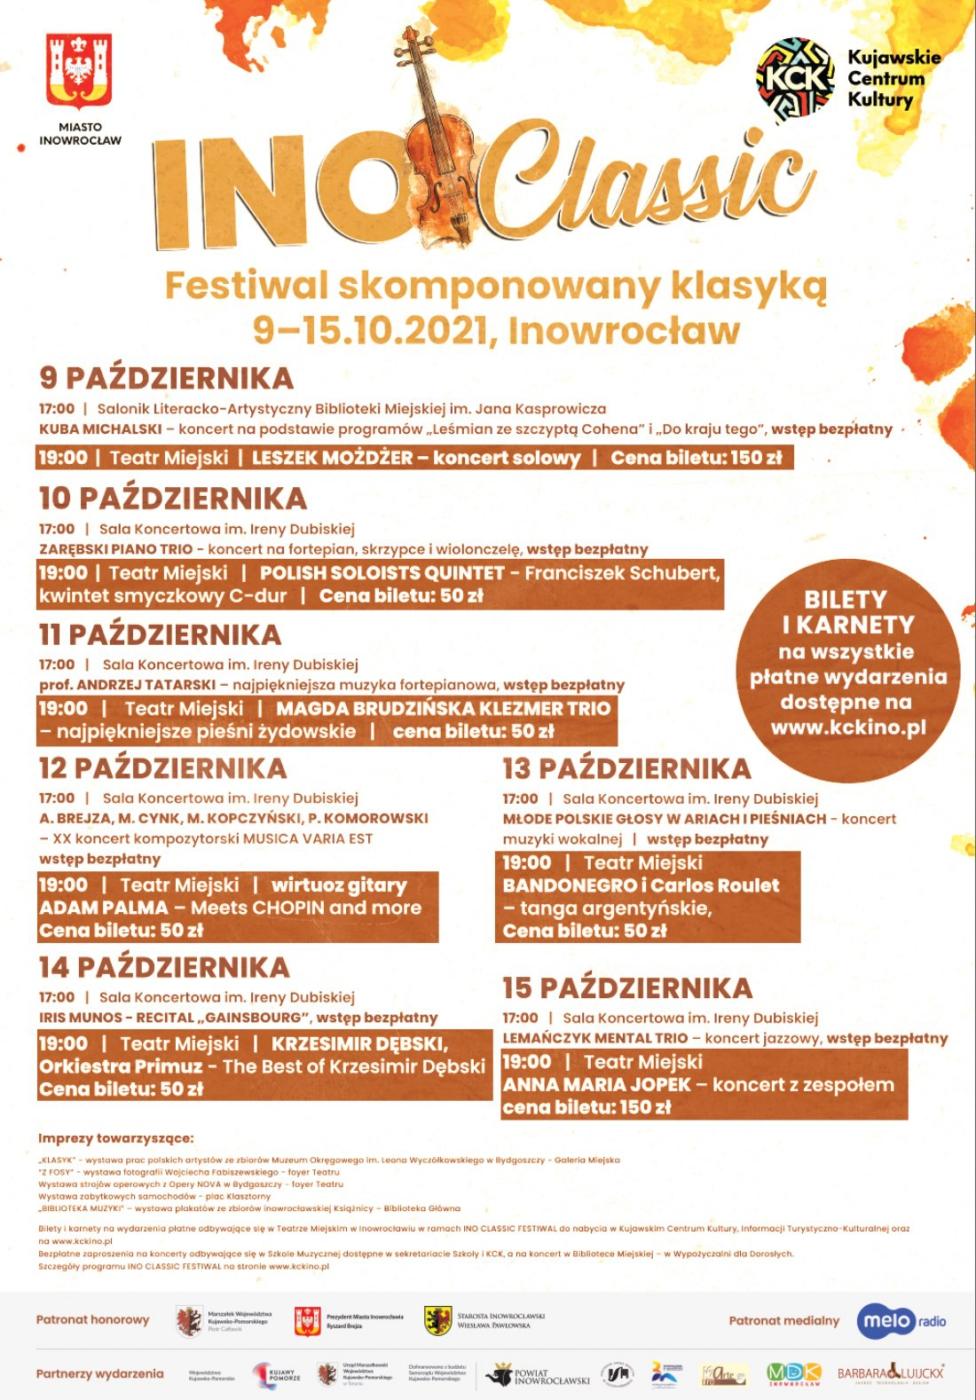 Ino Classic Festiwal 2021 - program